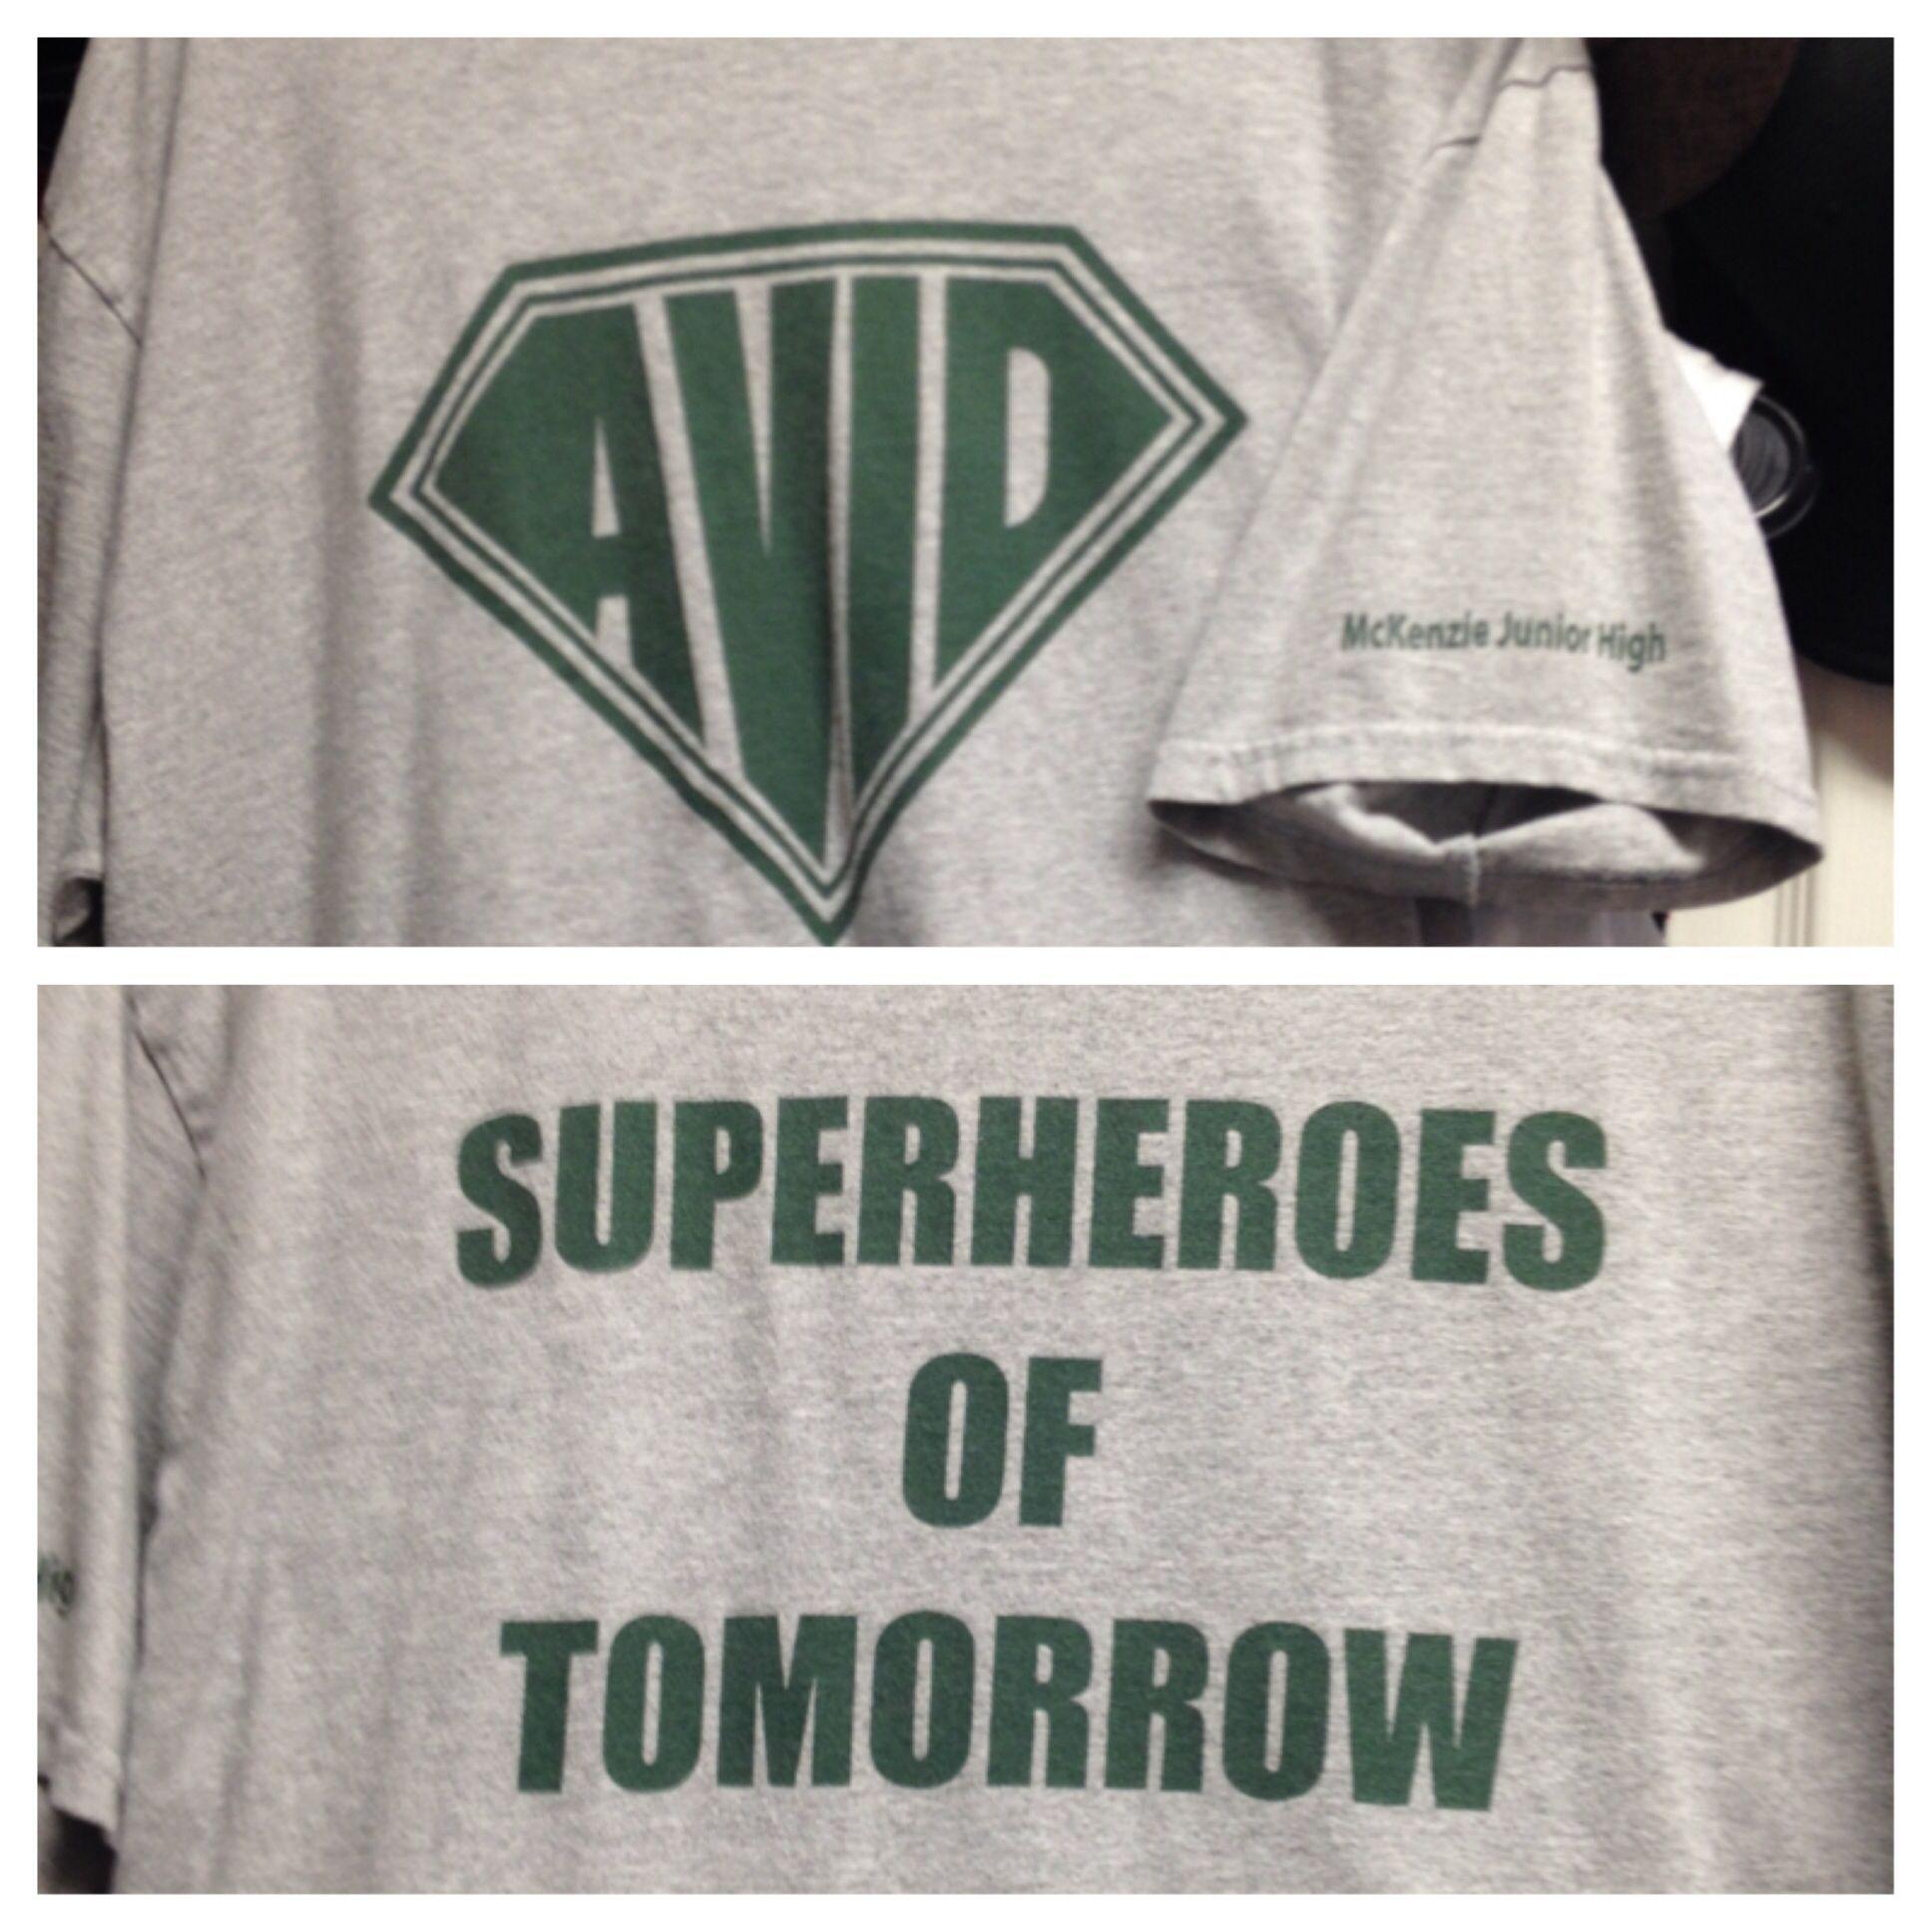 Shirt design rubric - Avid T Shirt Design